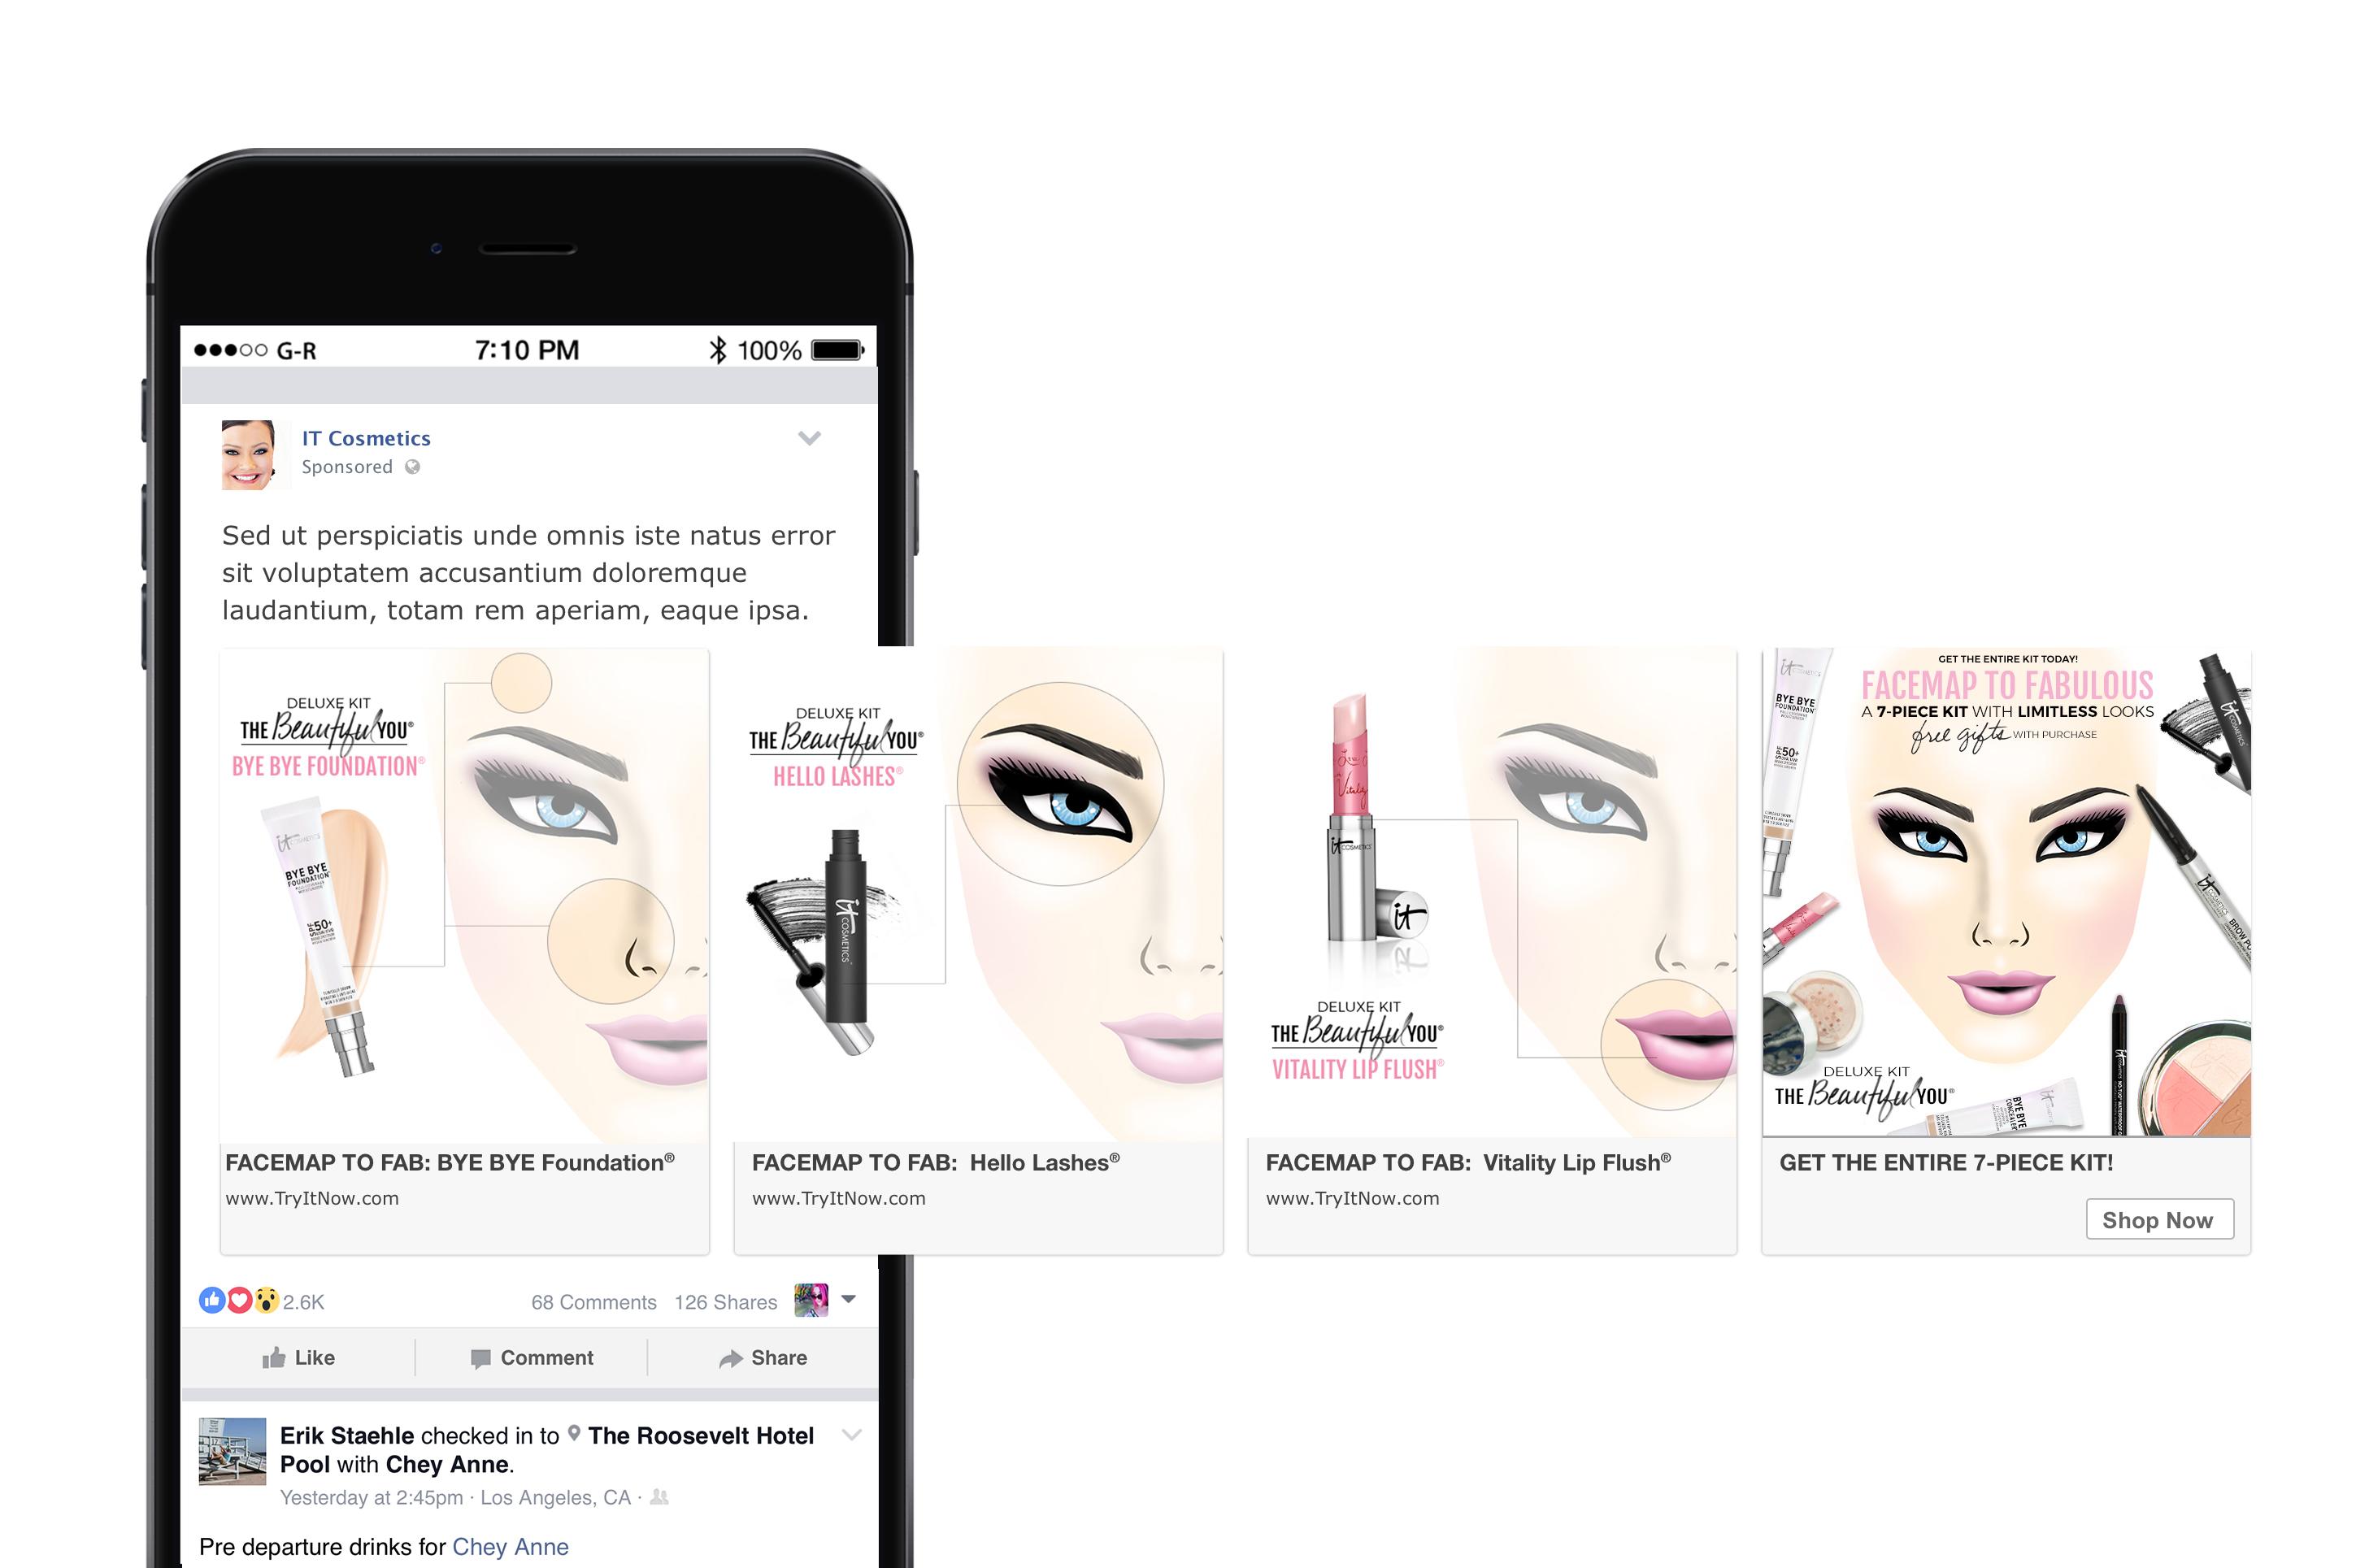 IT Cosmetics Facemap Carousel